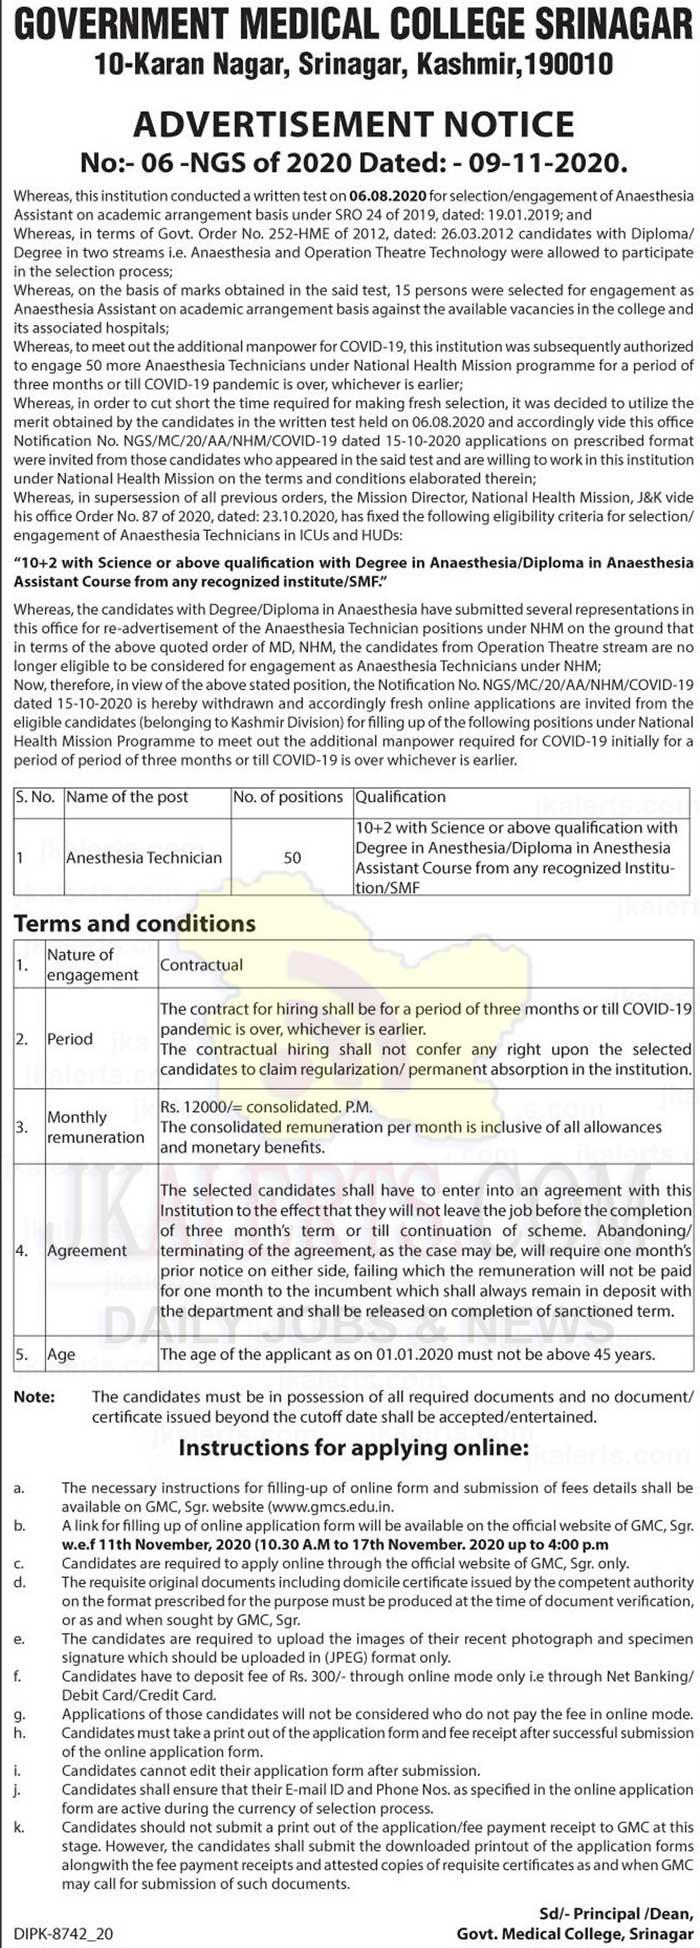 GMC Srinagar Jobs Recruitment 2020 Anesthesia Technician 50 posts.